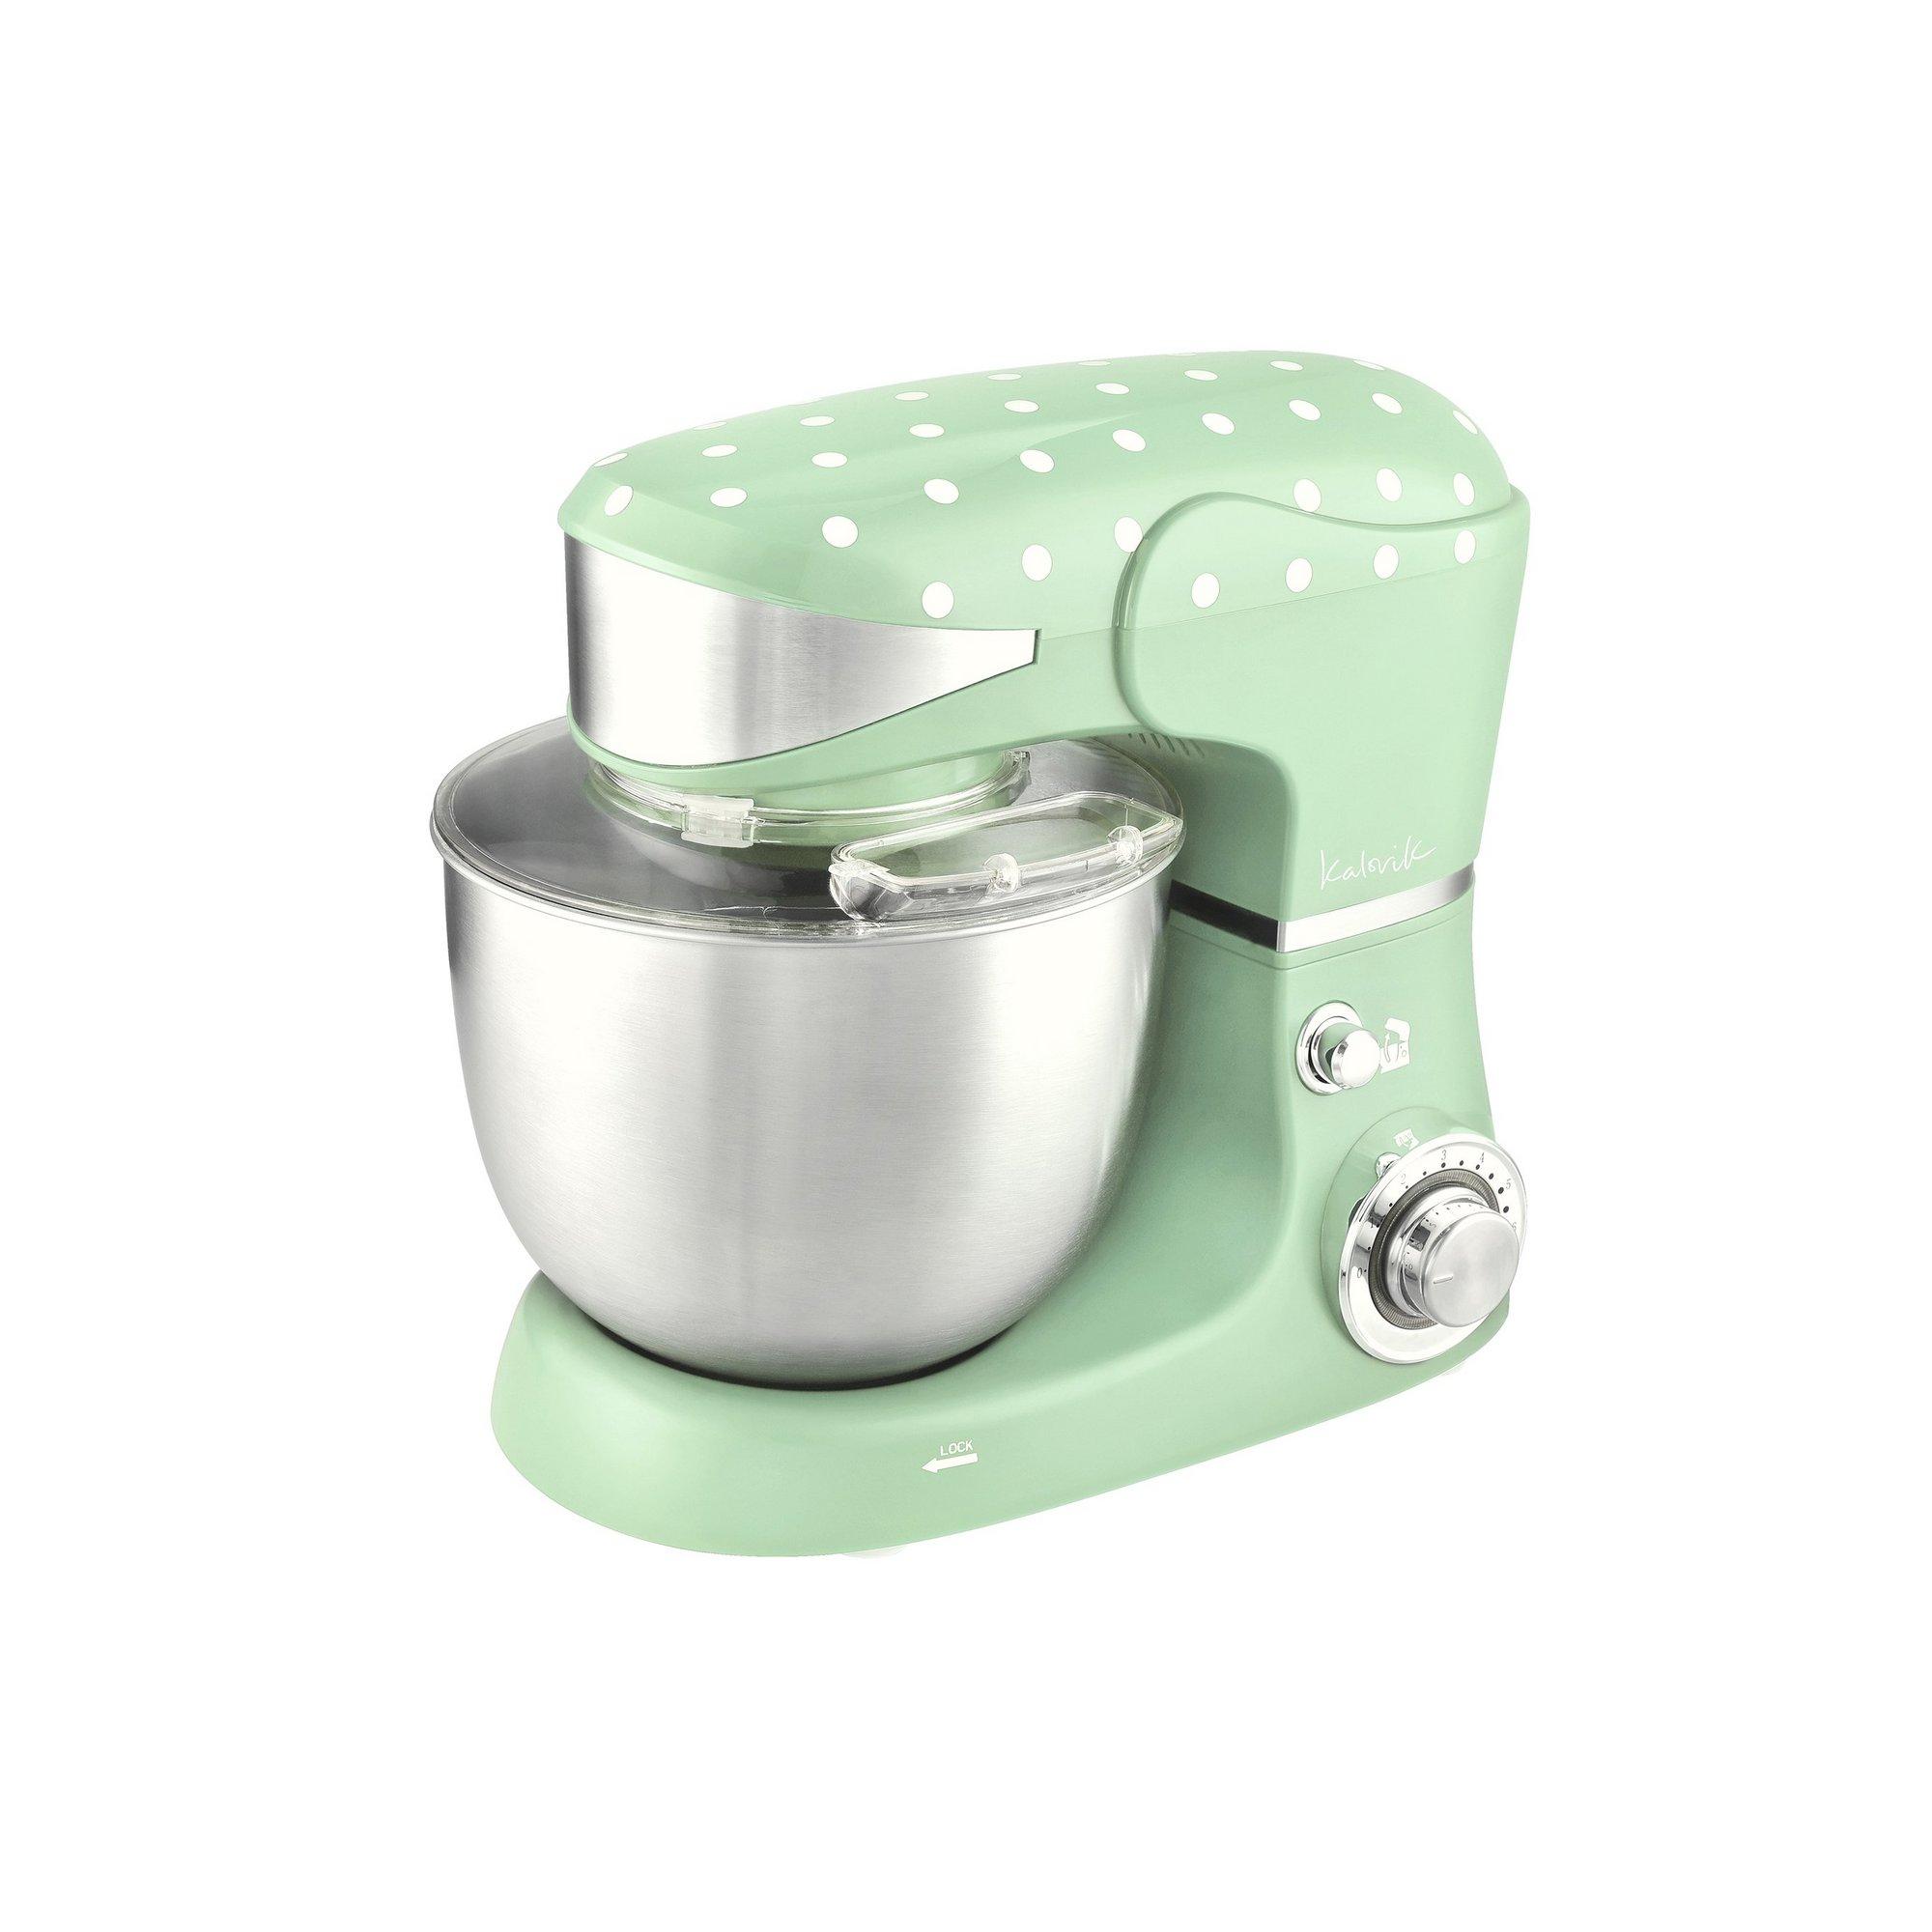 Image of Kalorik 5L Stand Mixer